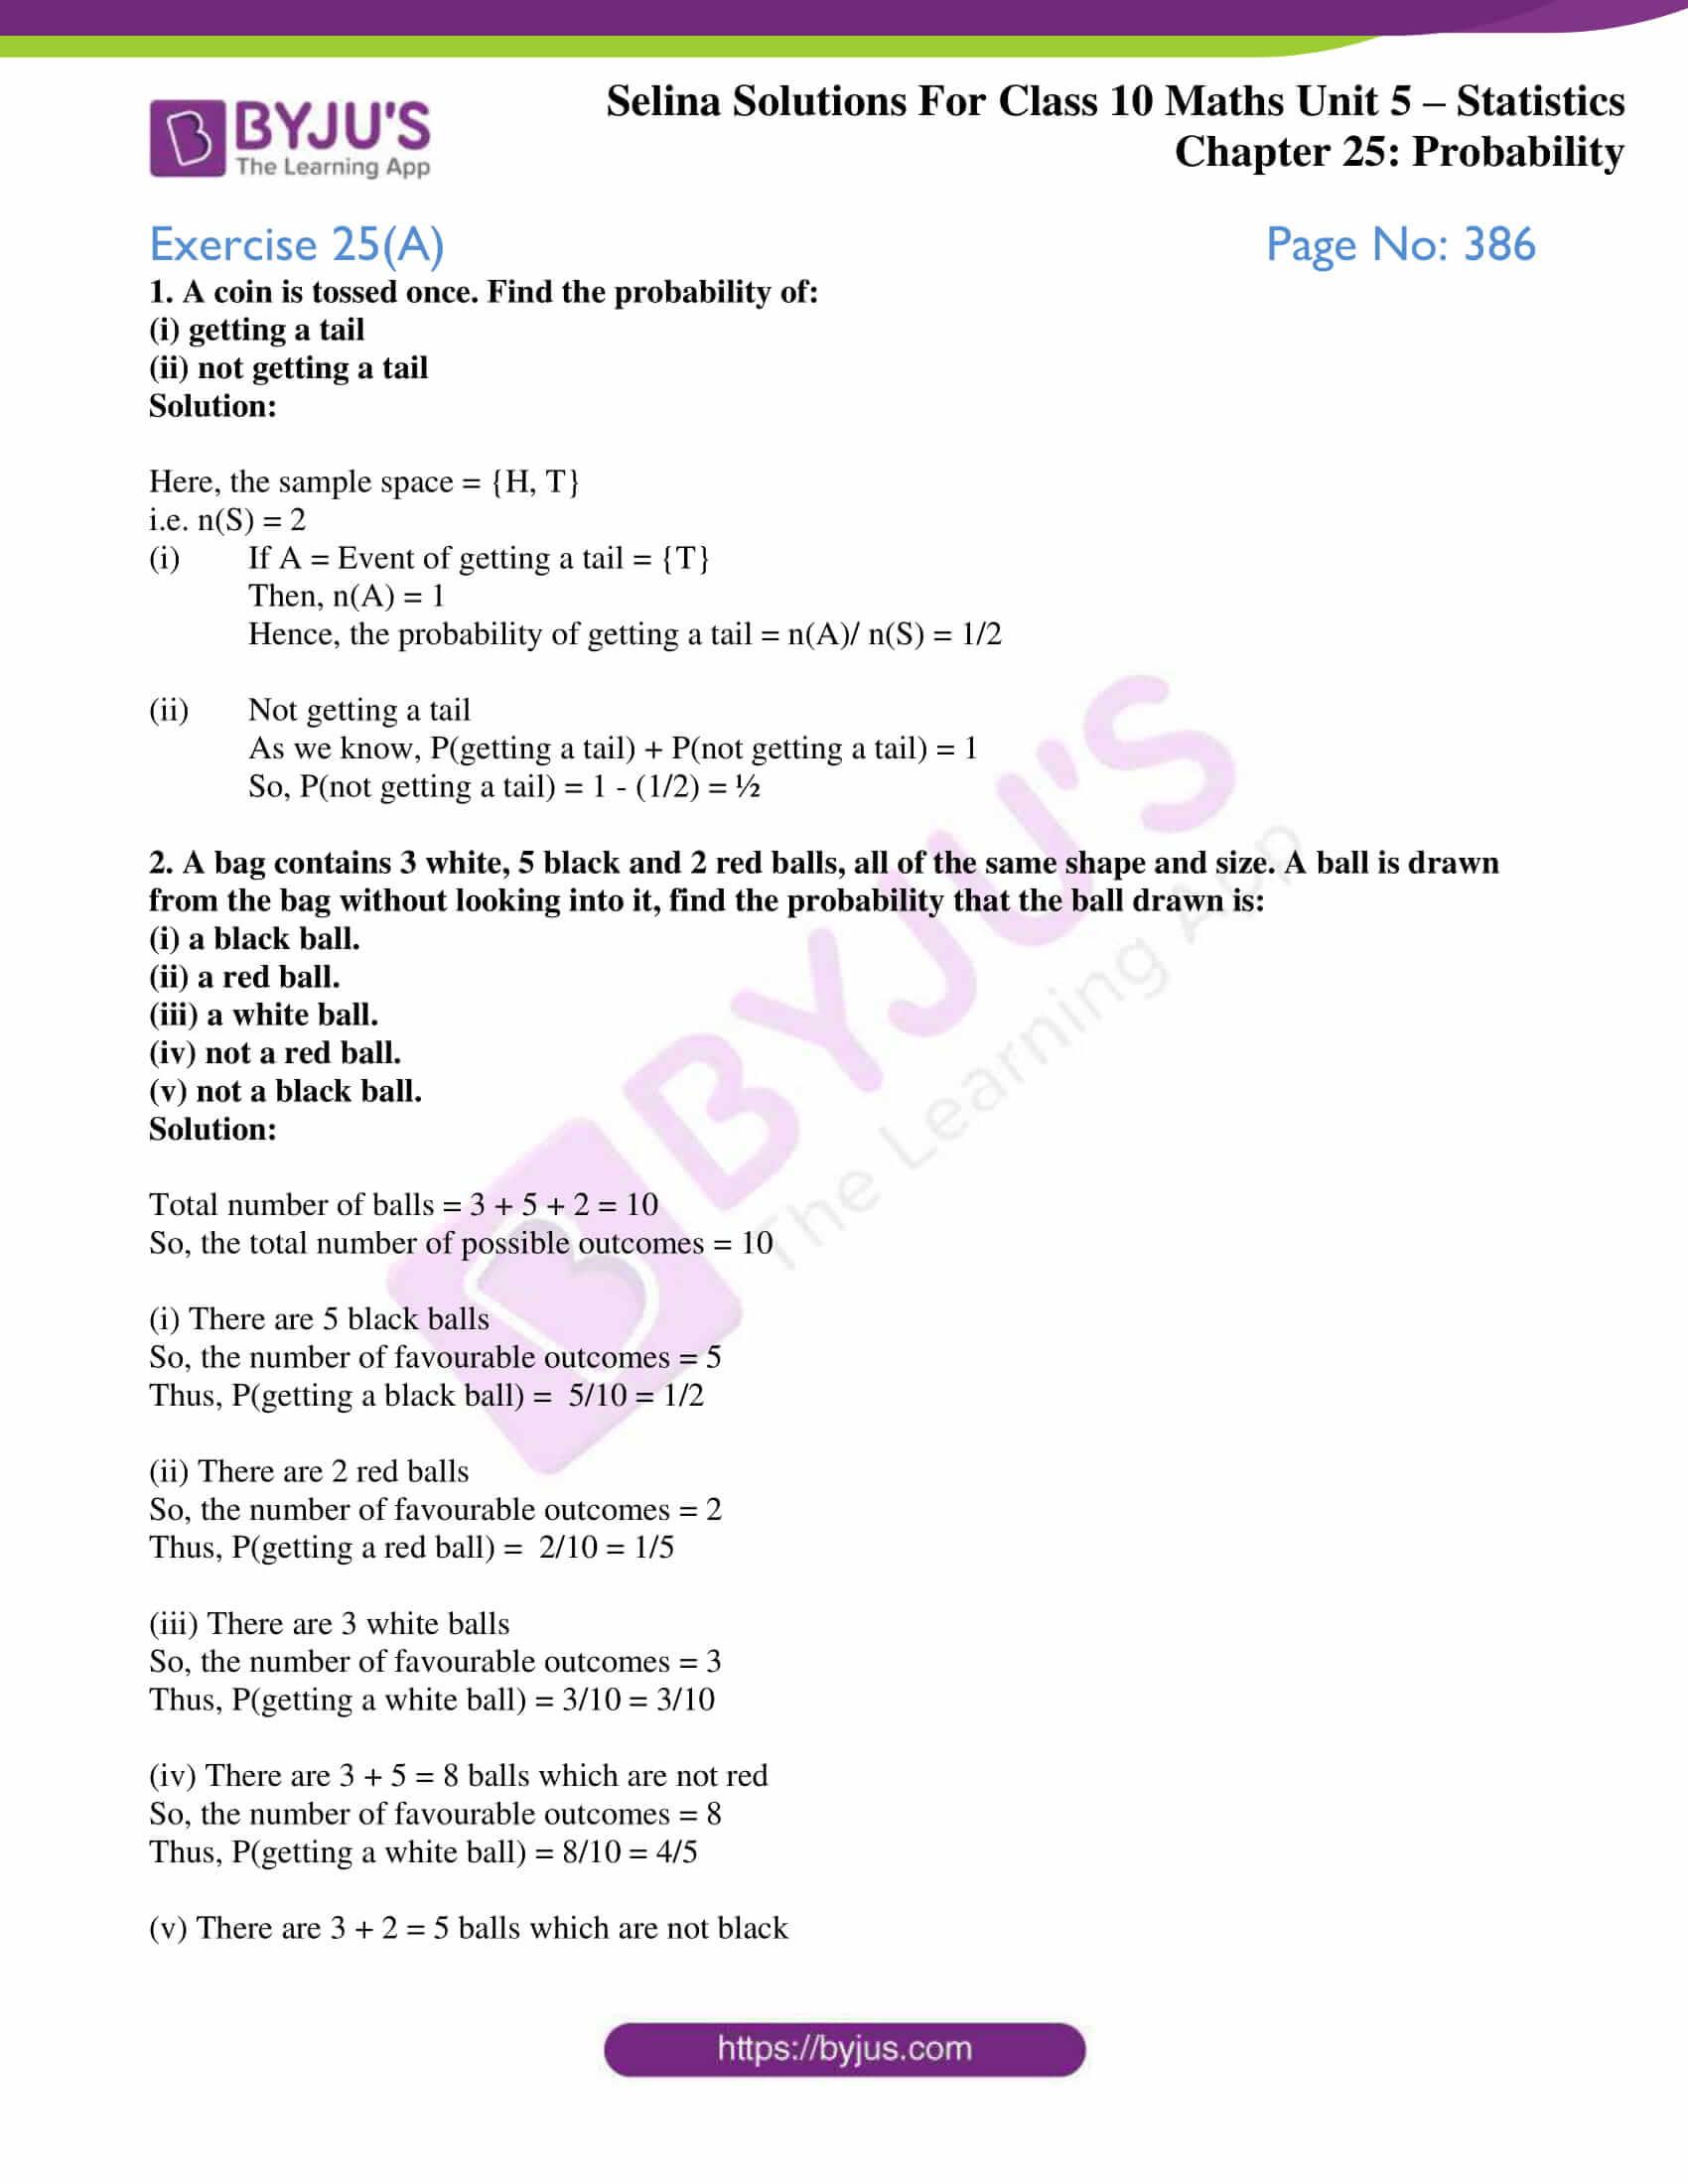 selina-sol-maths-class-10-ch-25-ex-a-1